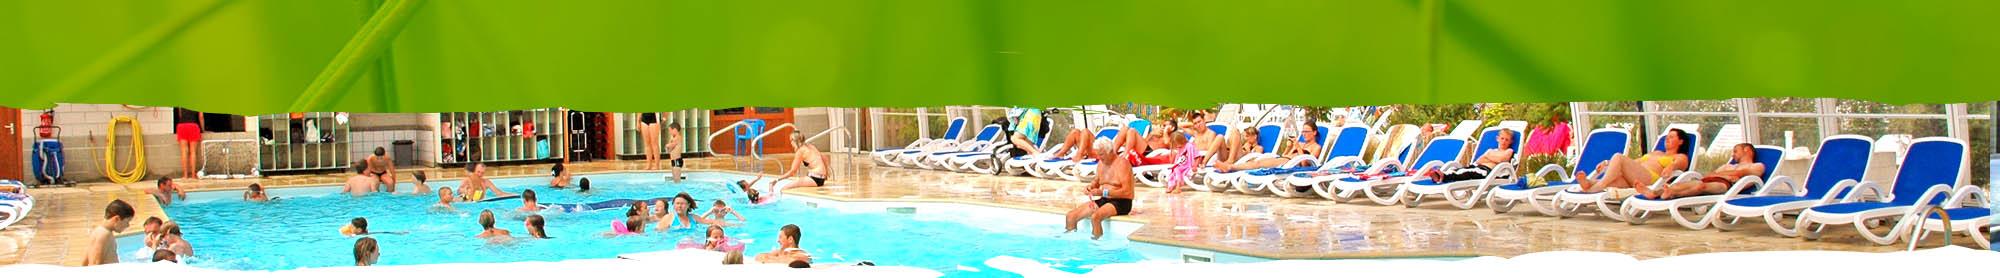 Hotels nord pas de calais piscine for Camping pas de calais avec piscine